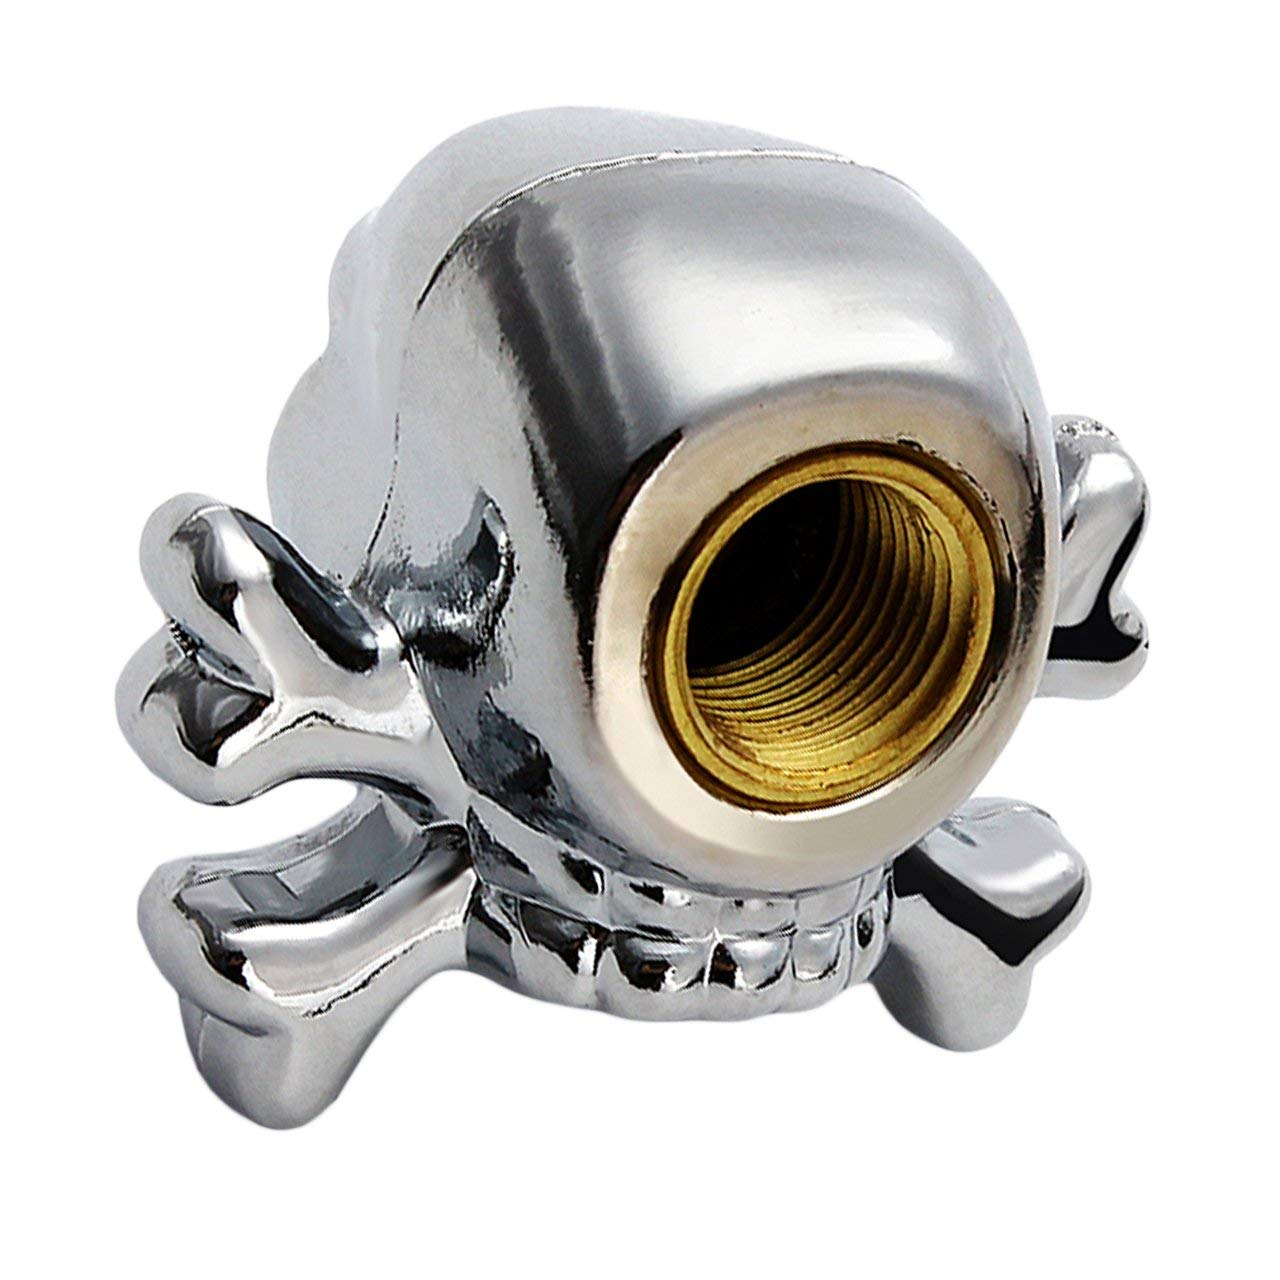 4 pcs Sliver Universal Fancy Pirate Skull Tire Tyre Air Valve Stem Caps for Auto Car Truck Motorcycle Bike Wheel Rims